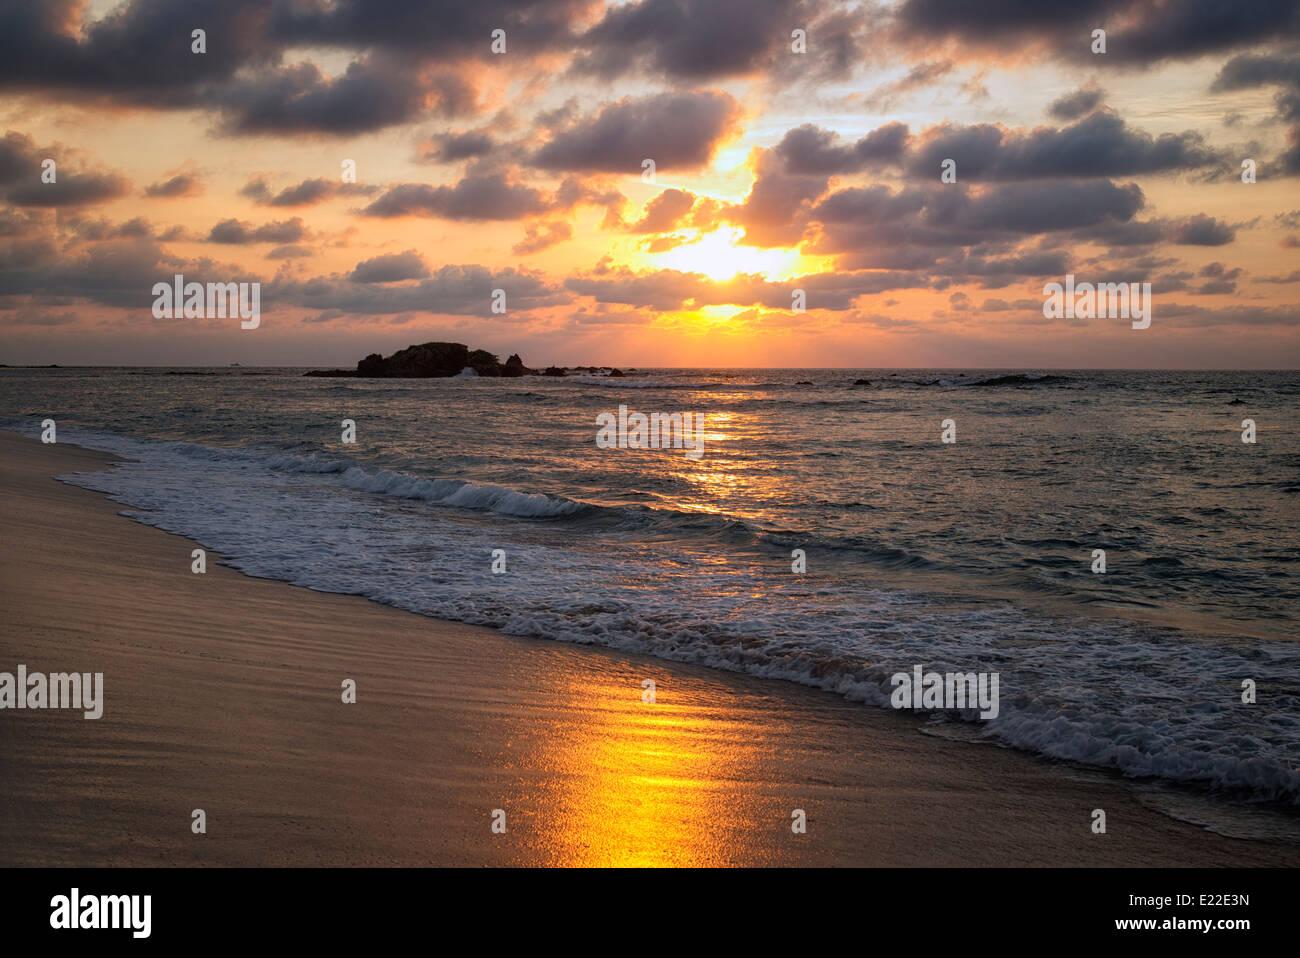 Sunset on beach. Punta Mita, Mexico - Stock Image